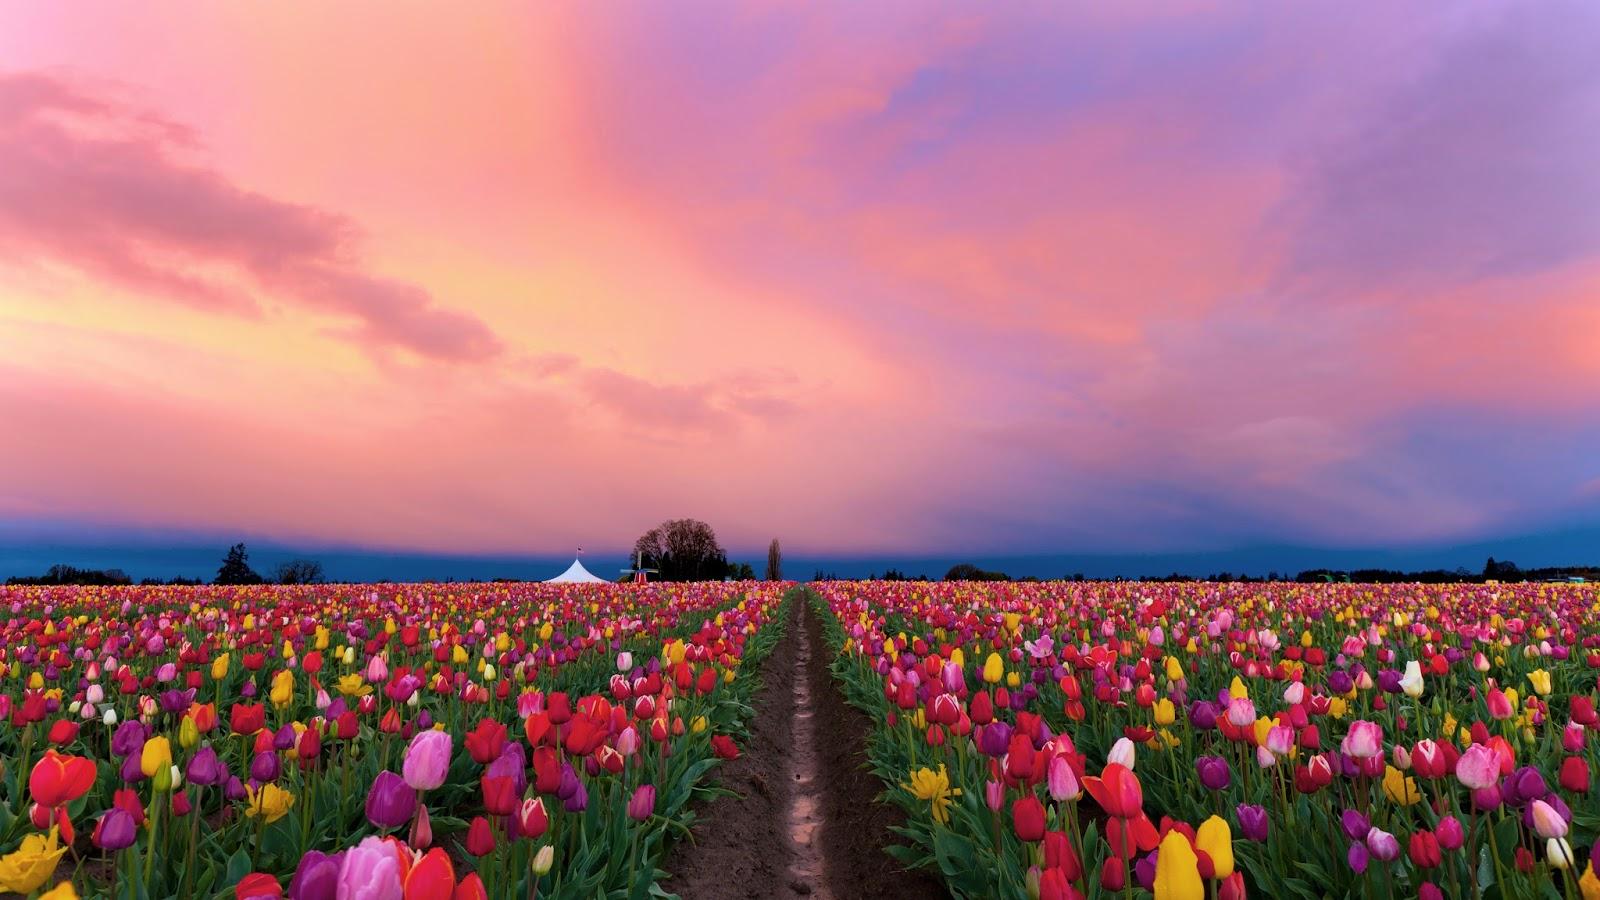 Daffodils Wallpaper Hd Nature God S Creation